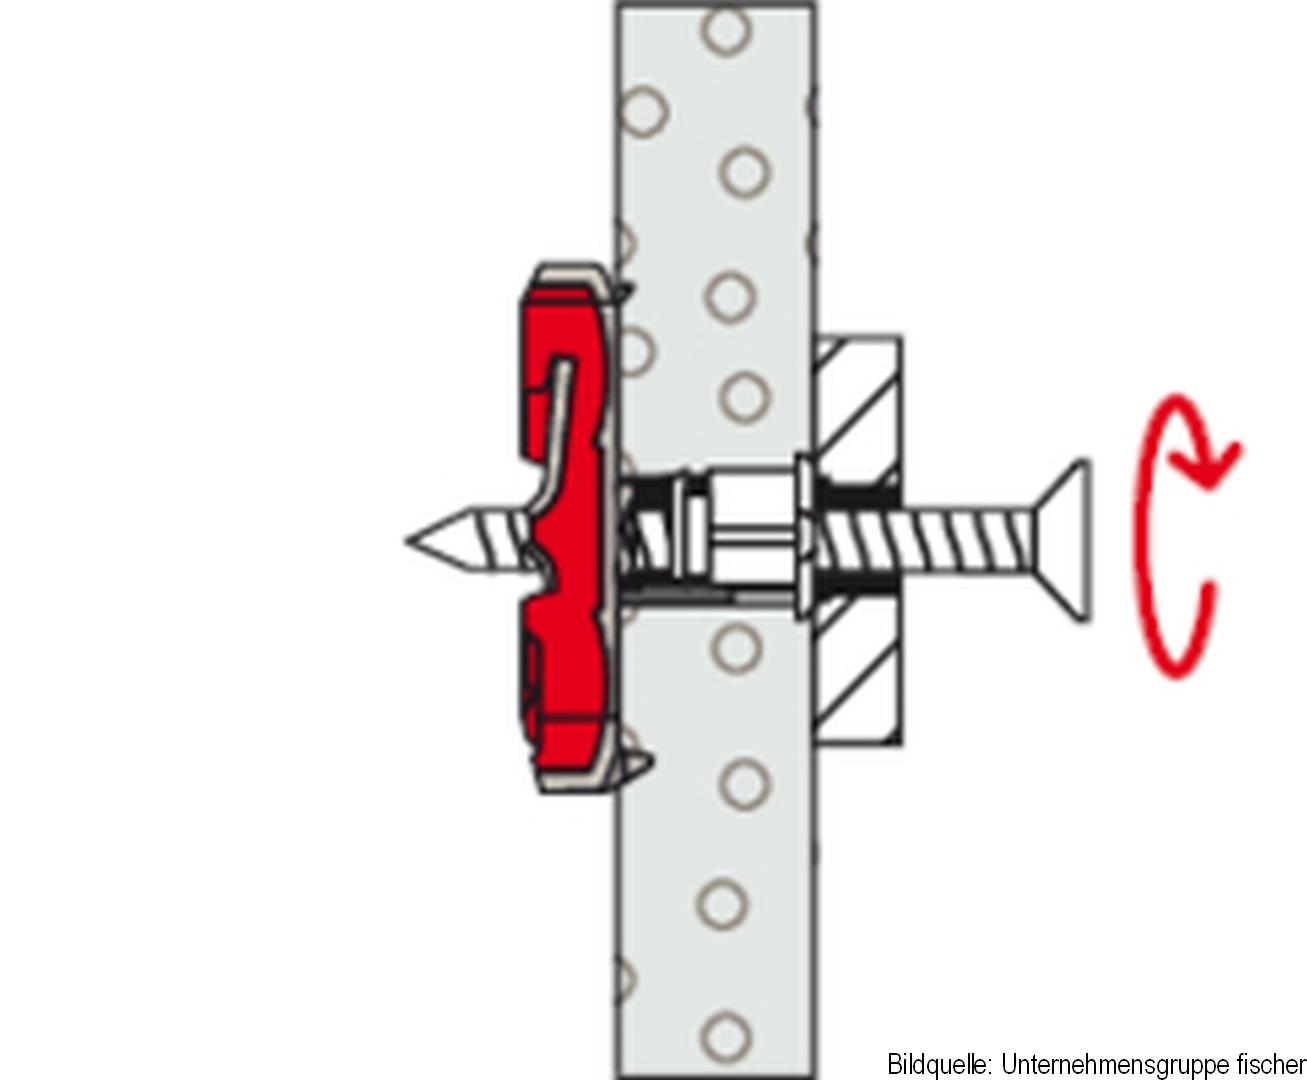 fischer Nylon-Kippdübel DuoTec, 10 x 50 mm, 2-er Pack